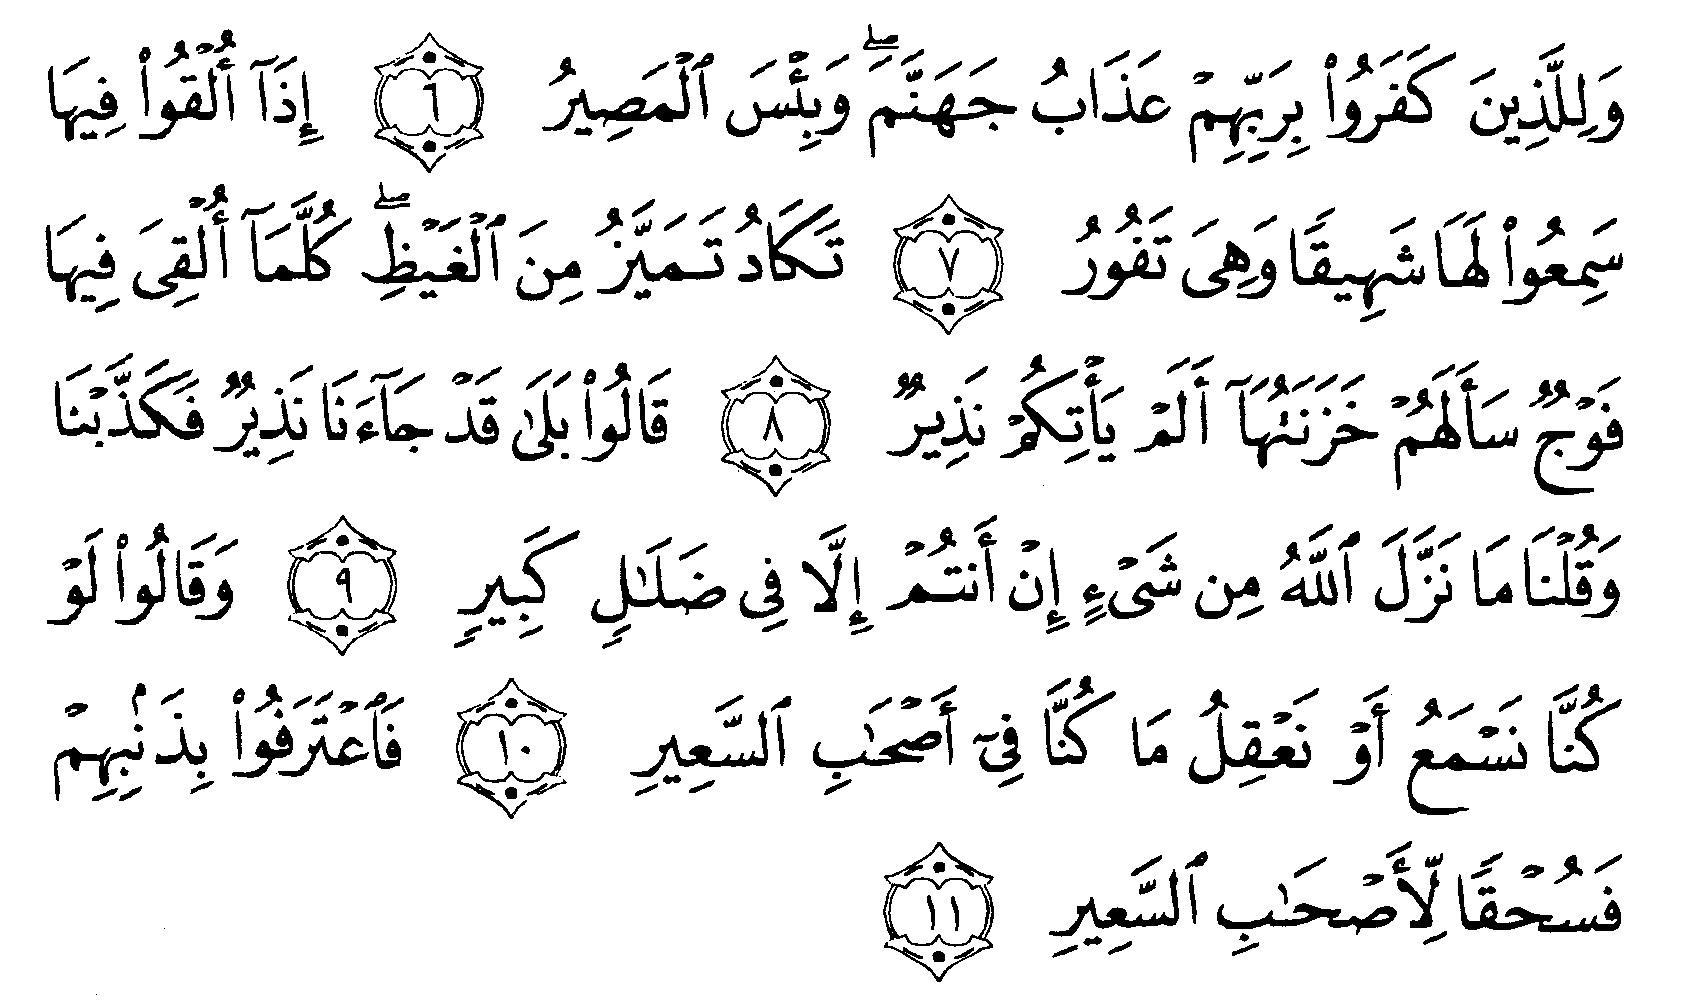 Tafsir Ibnu Katsir Surah Al Mulk 2 Alquranmulia